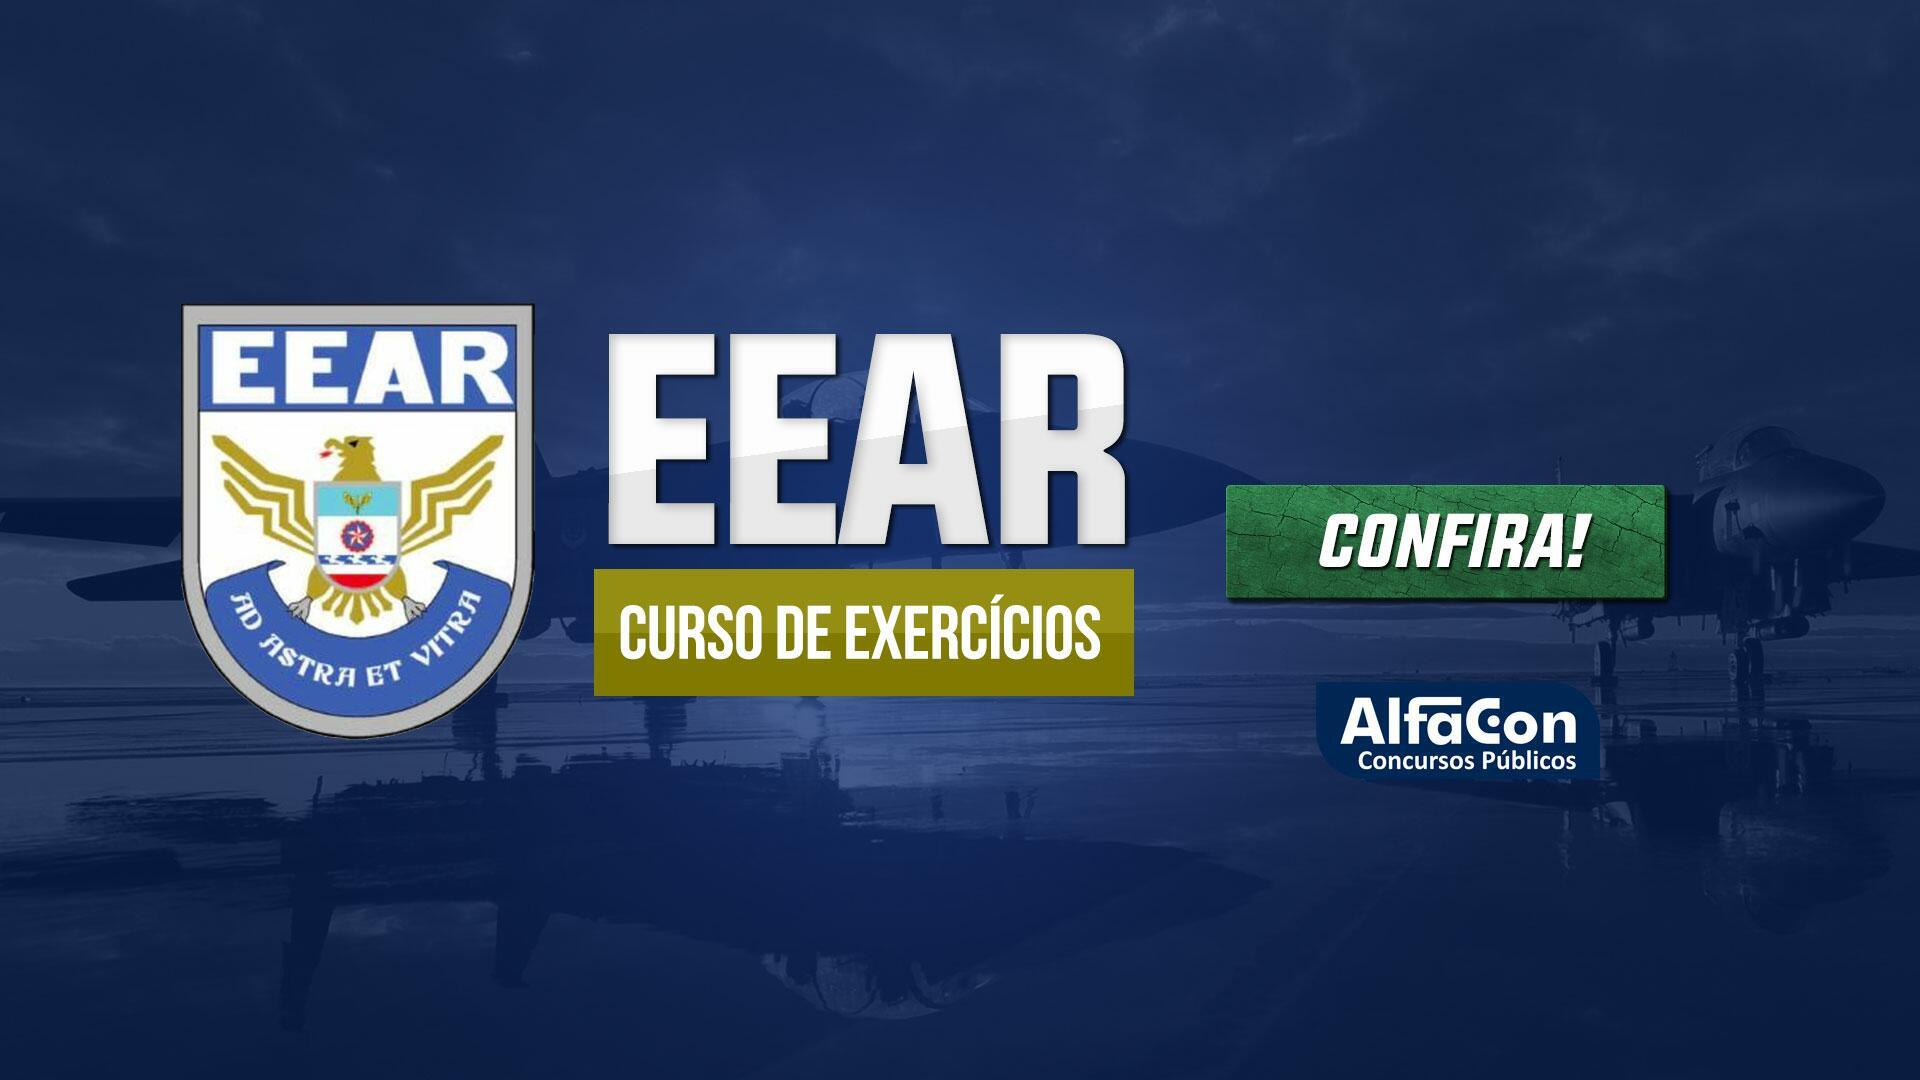 Curso de Exercícios Preparatório para EEAR (Escola de Especialistas de Aeronáutica)